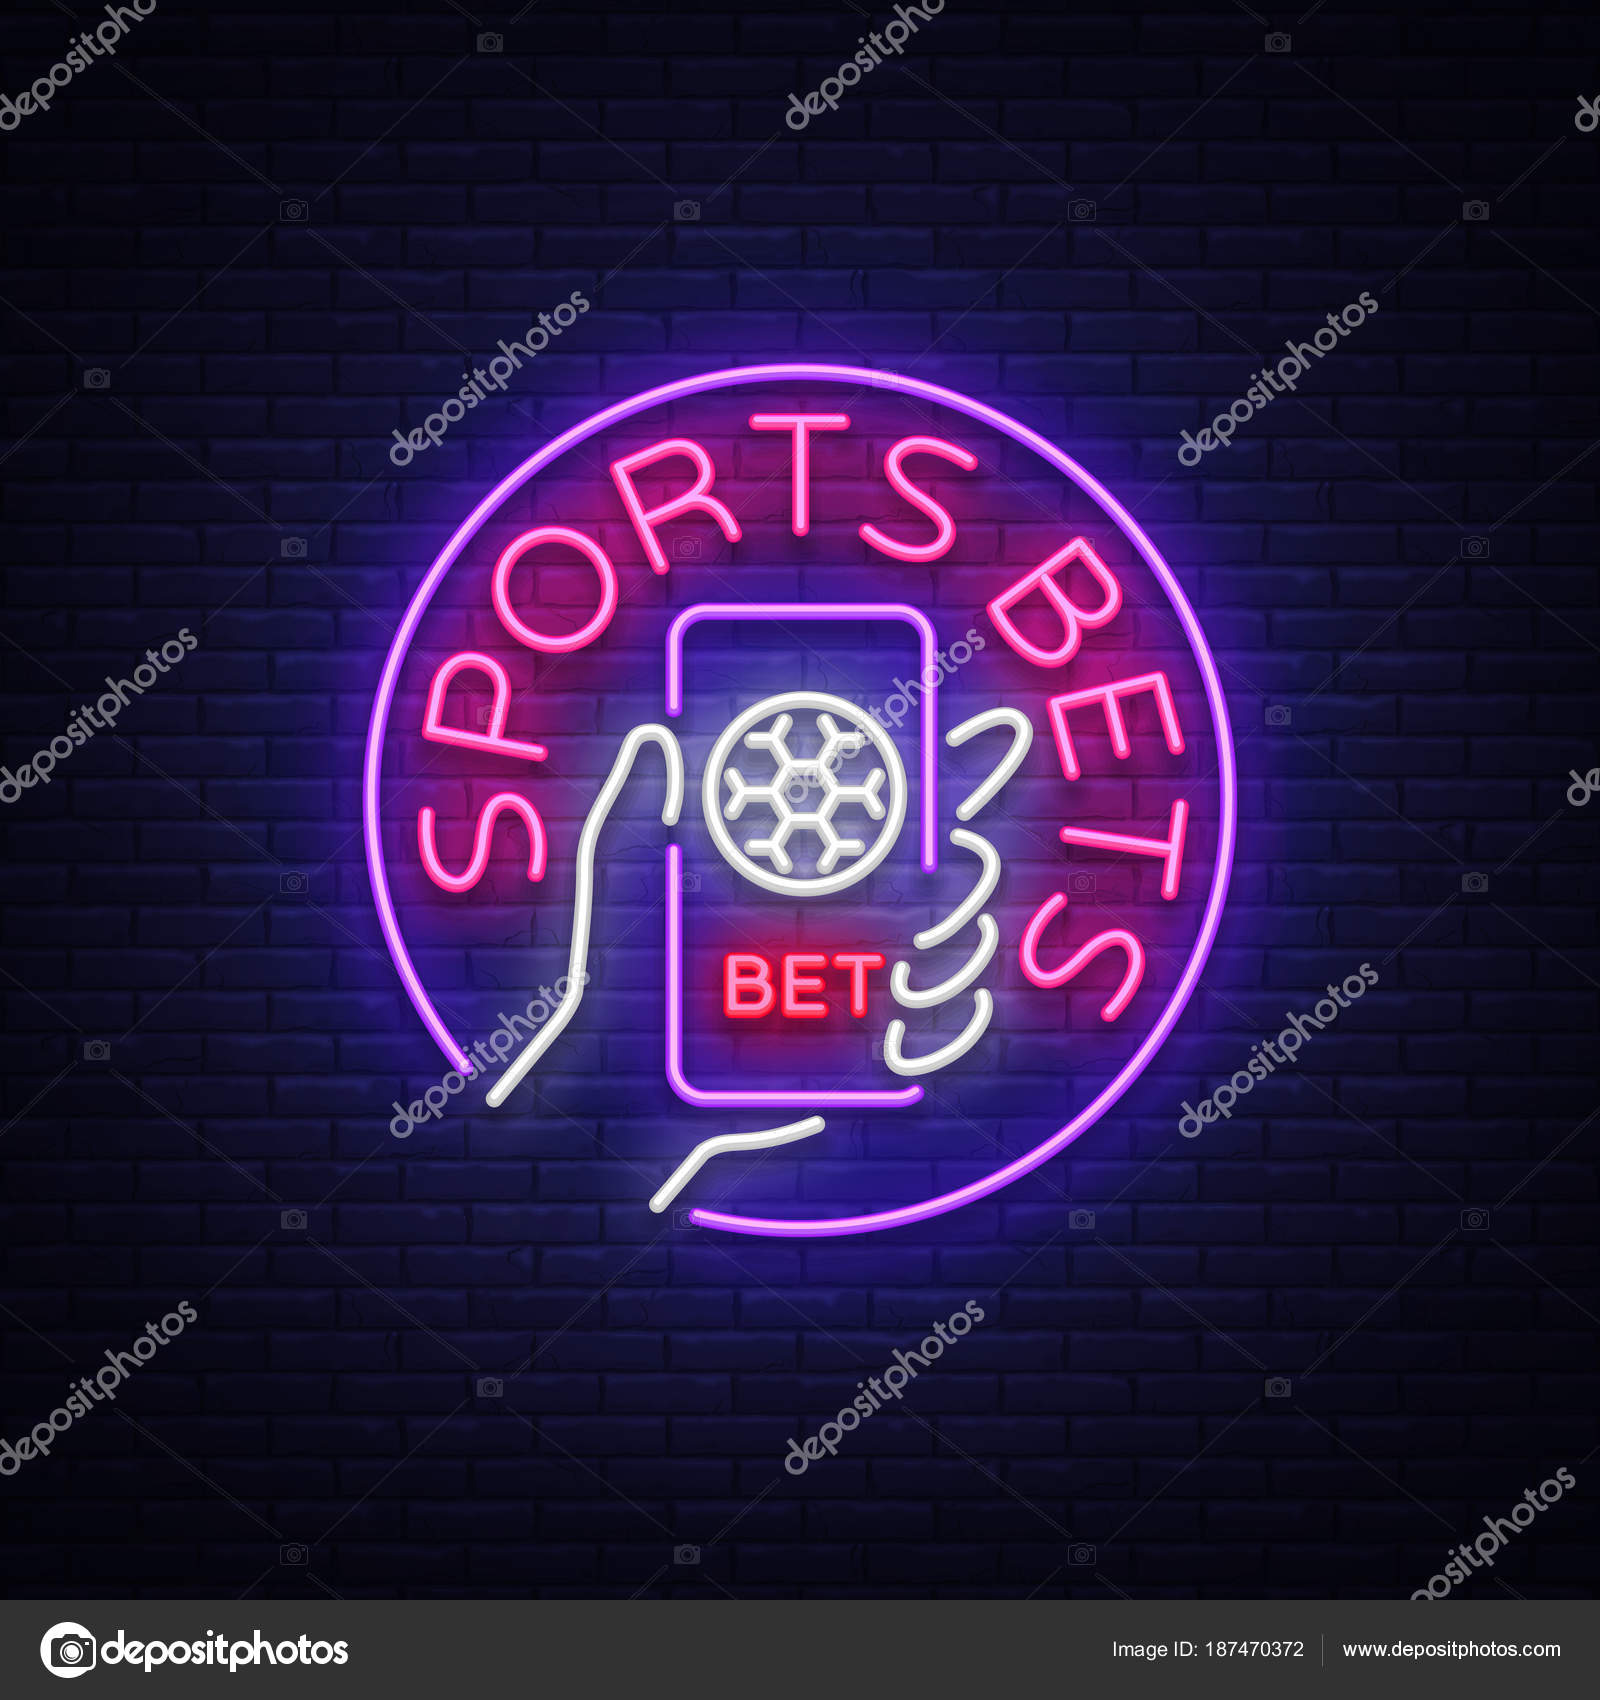 Ставки на спорт лого спорт превью прогнозы